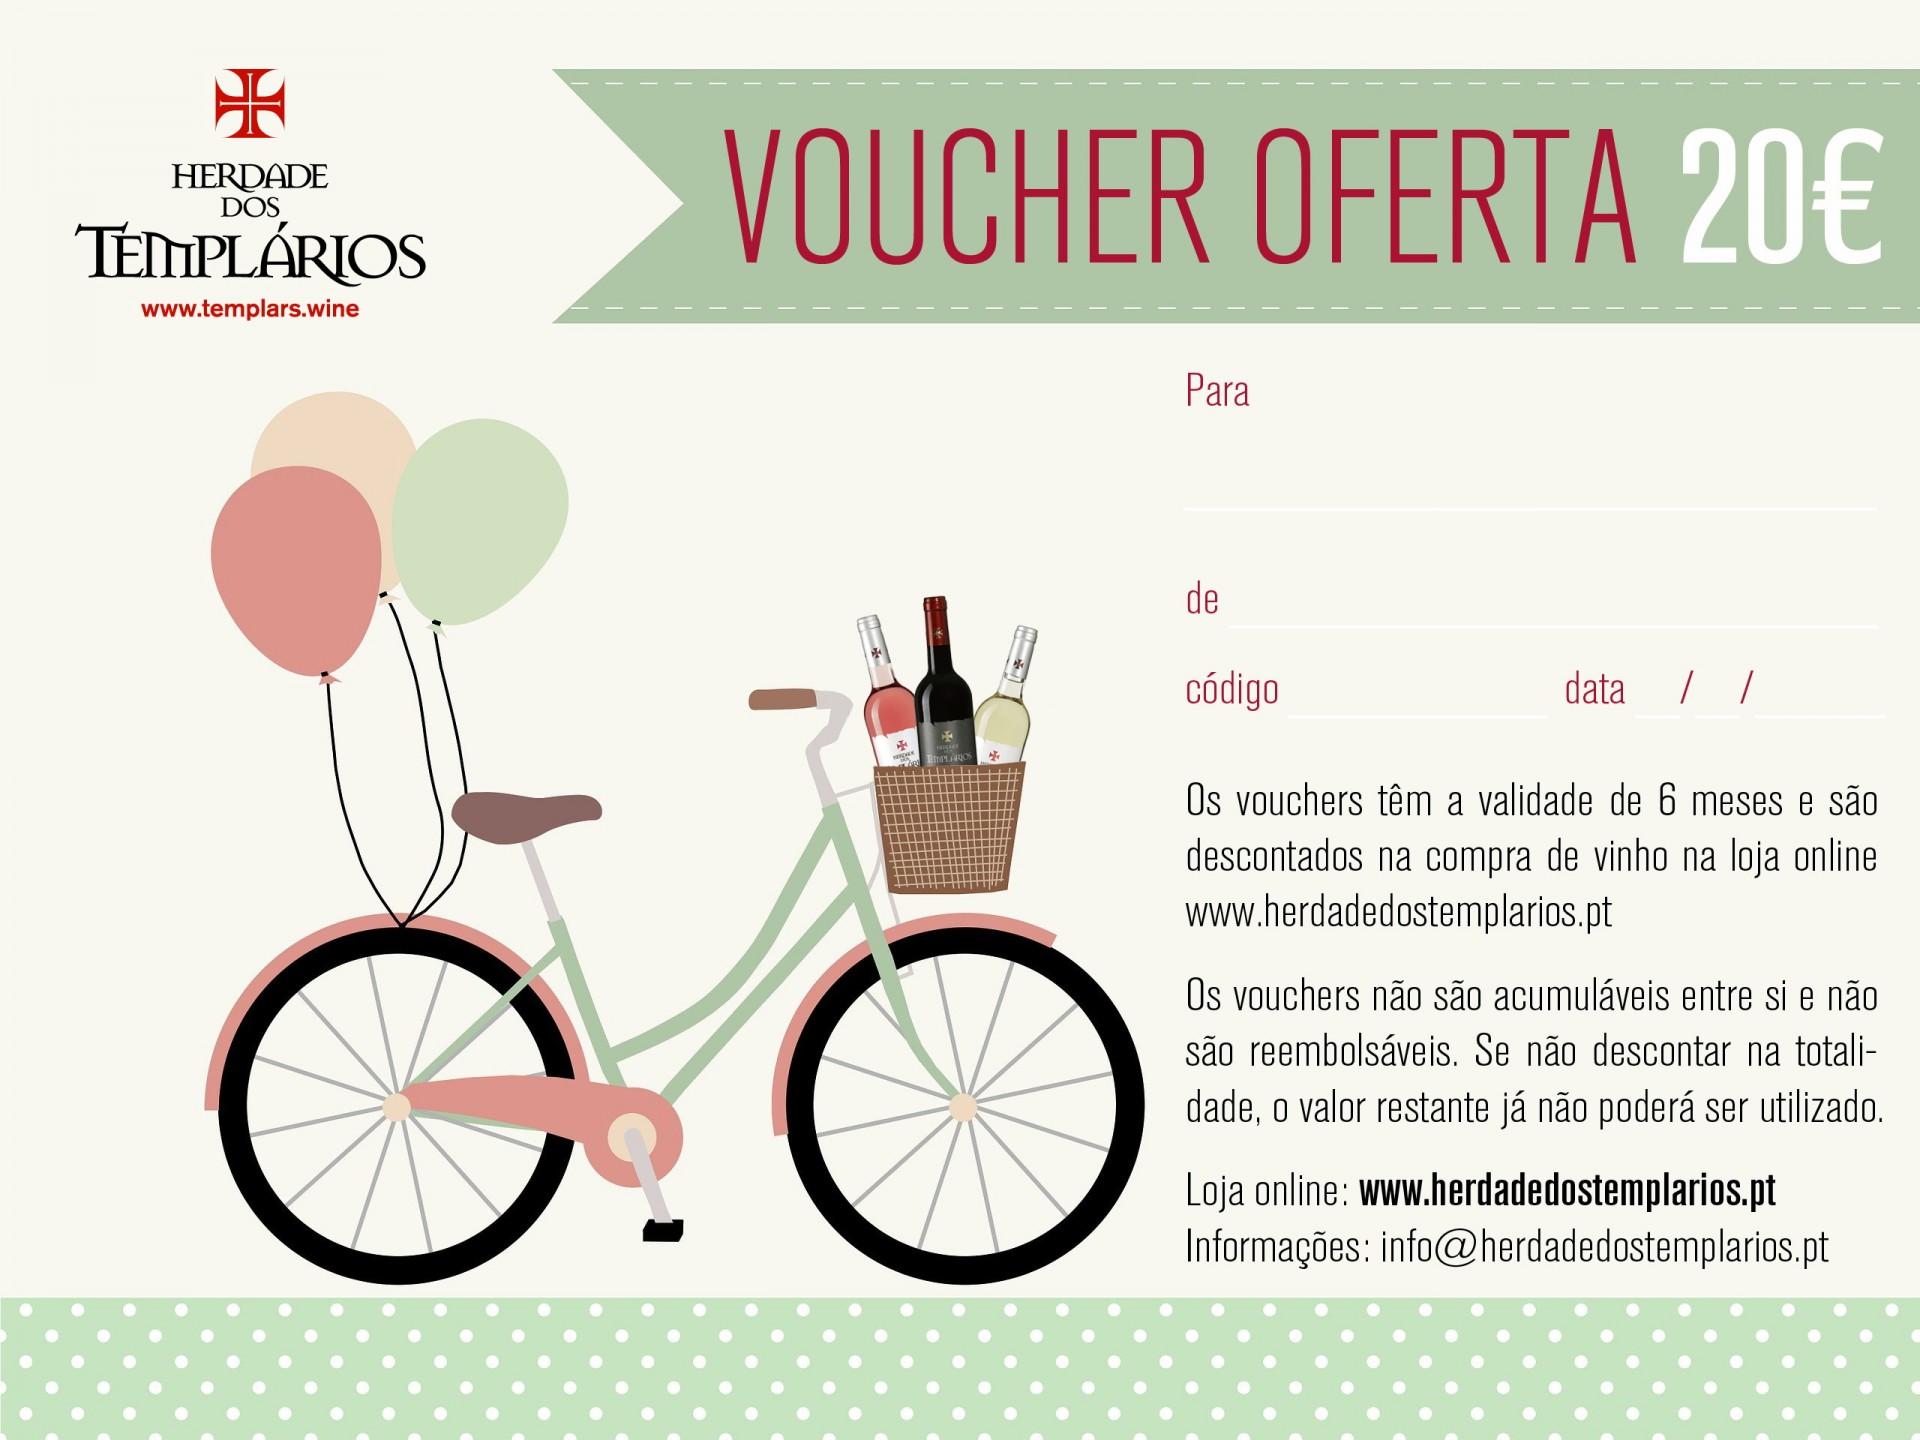 Voucher de Oferta - 20€